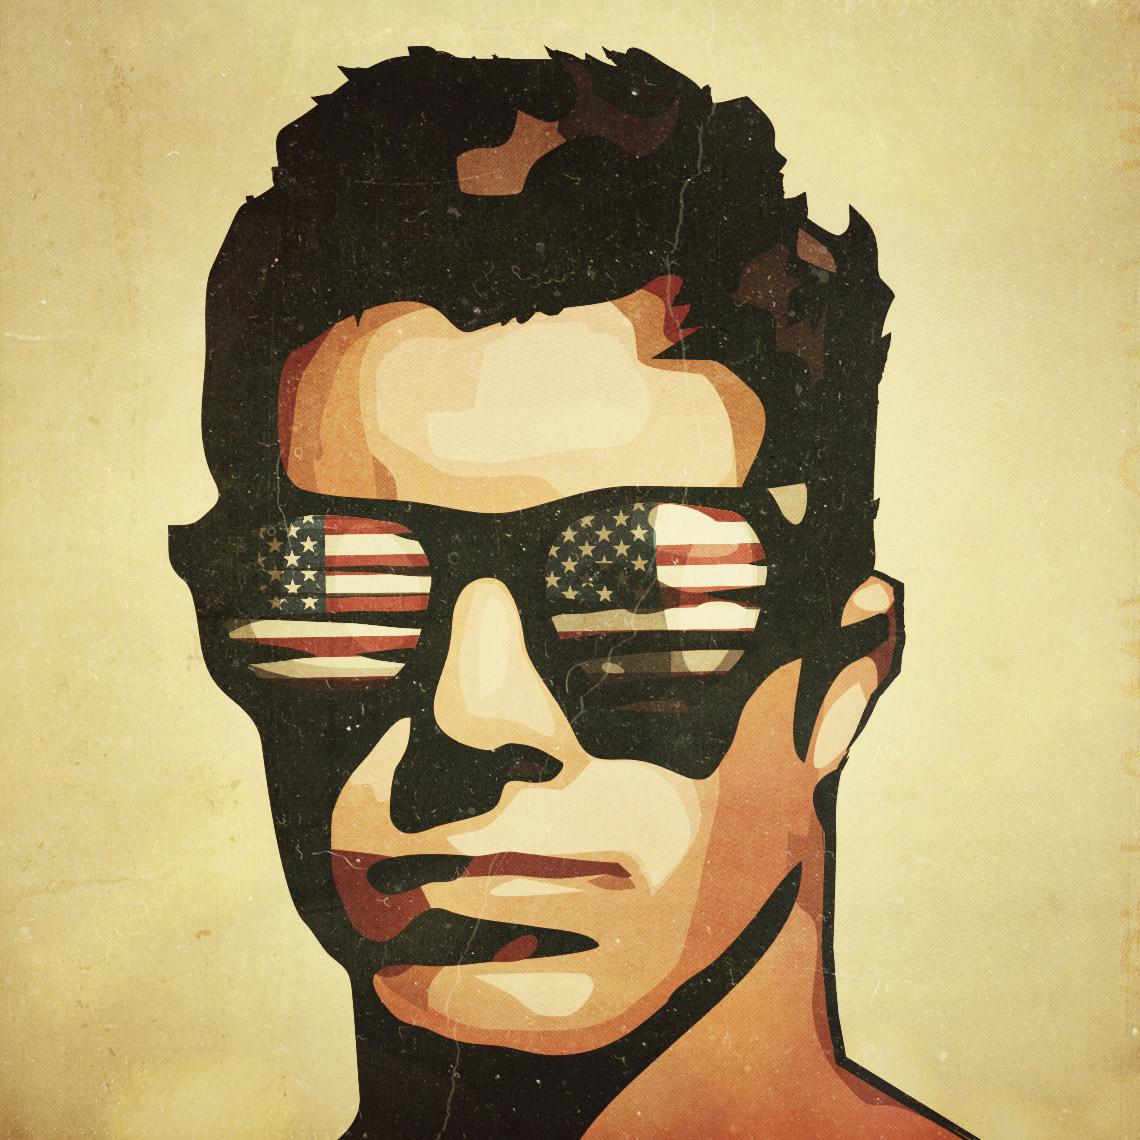 Mr All American